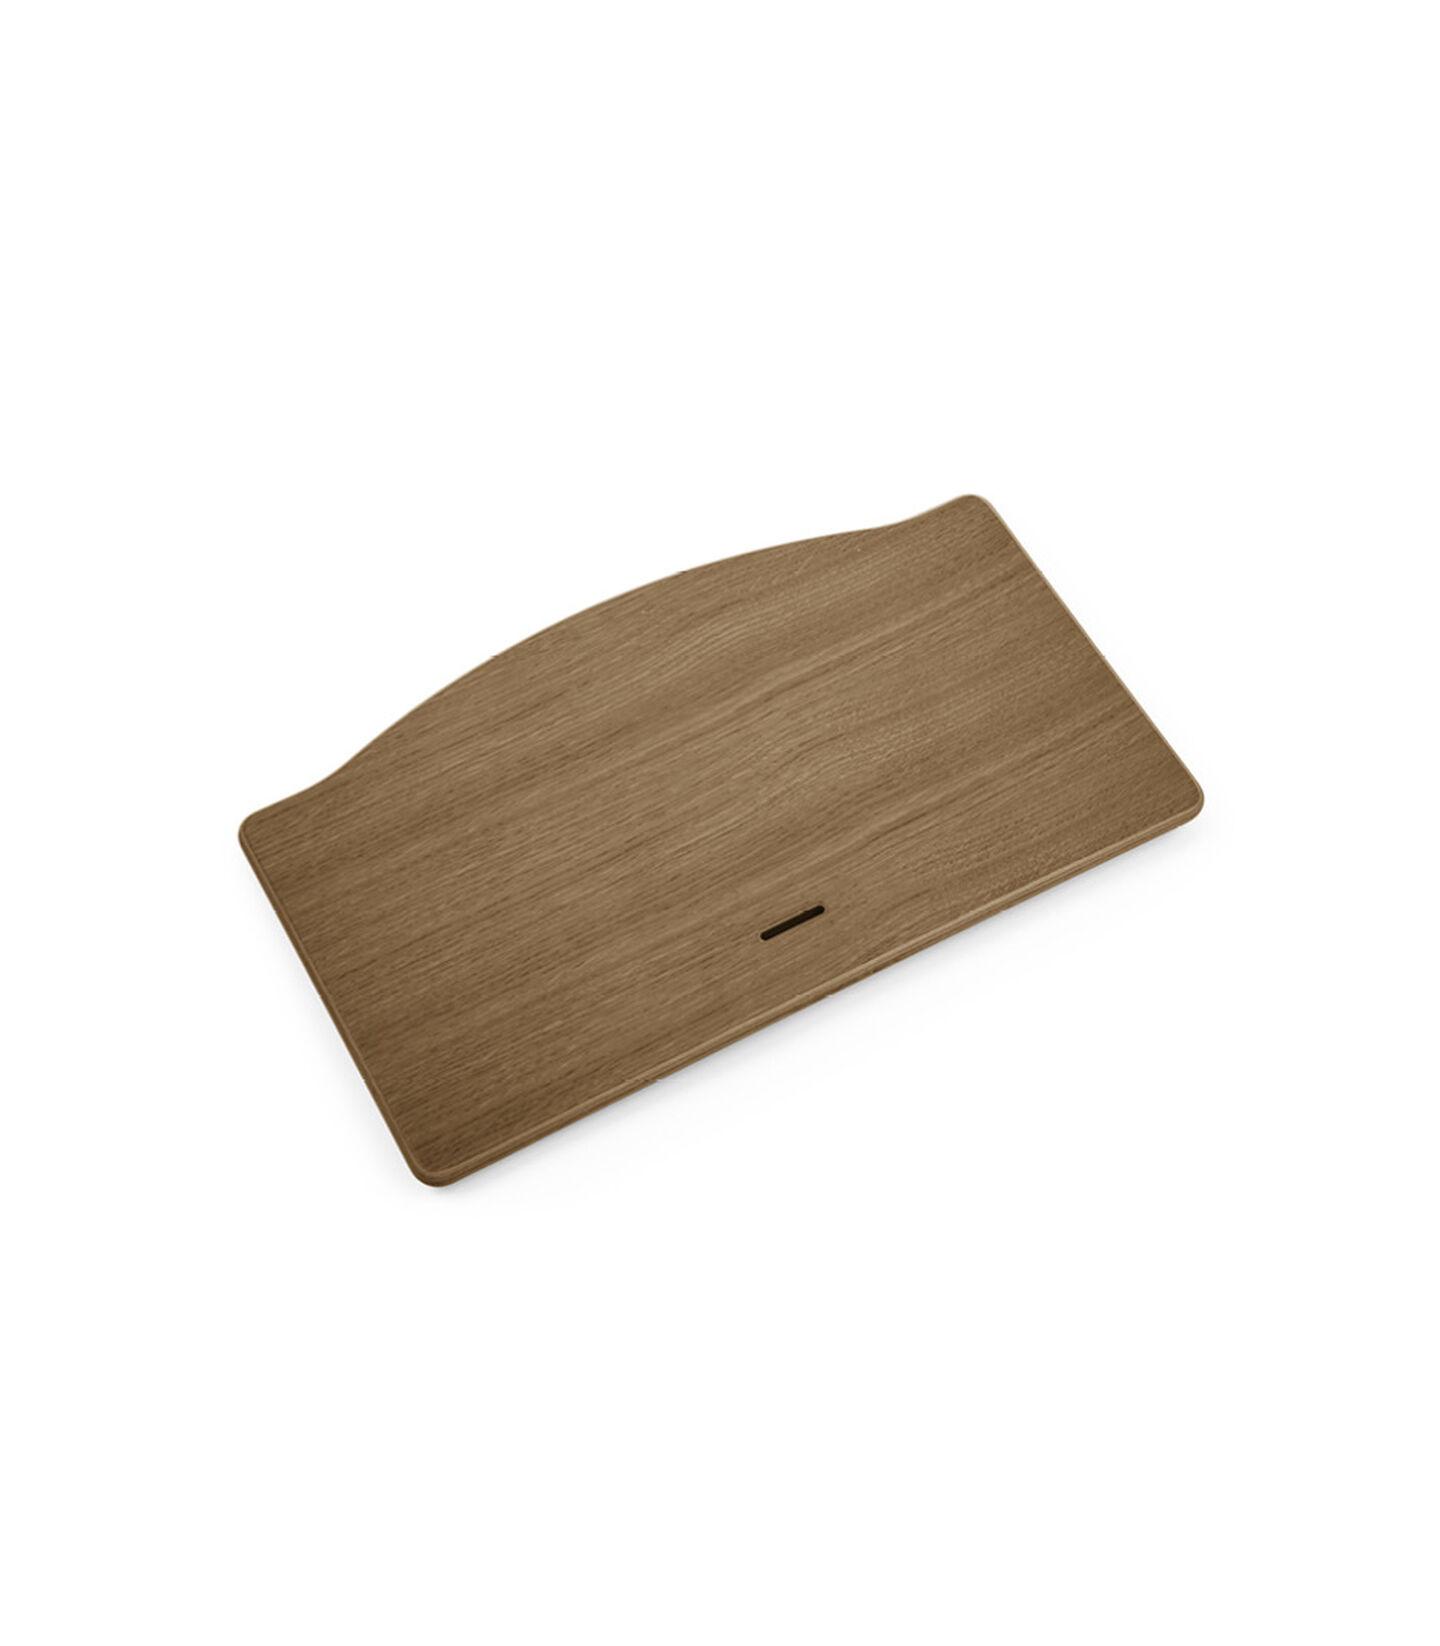 Tripp Trapp® Seatplate Oak Brown, Oak Brown, mainview view 1